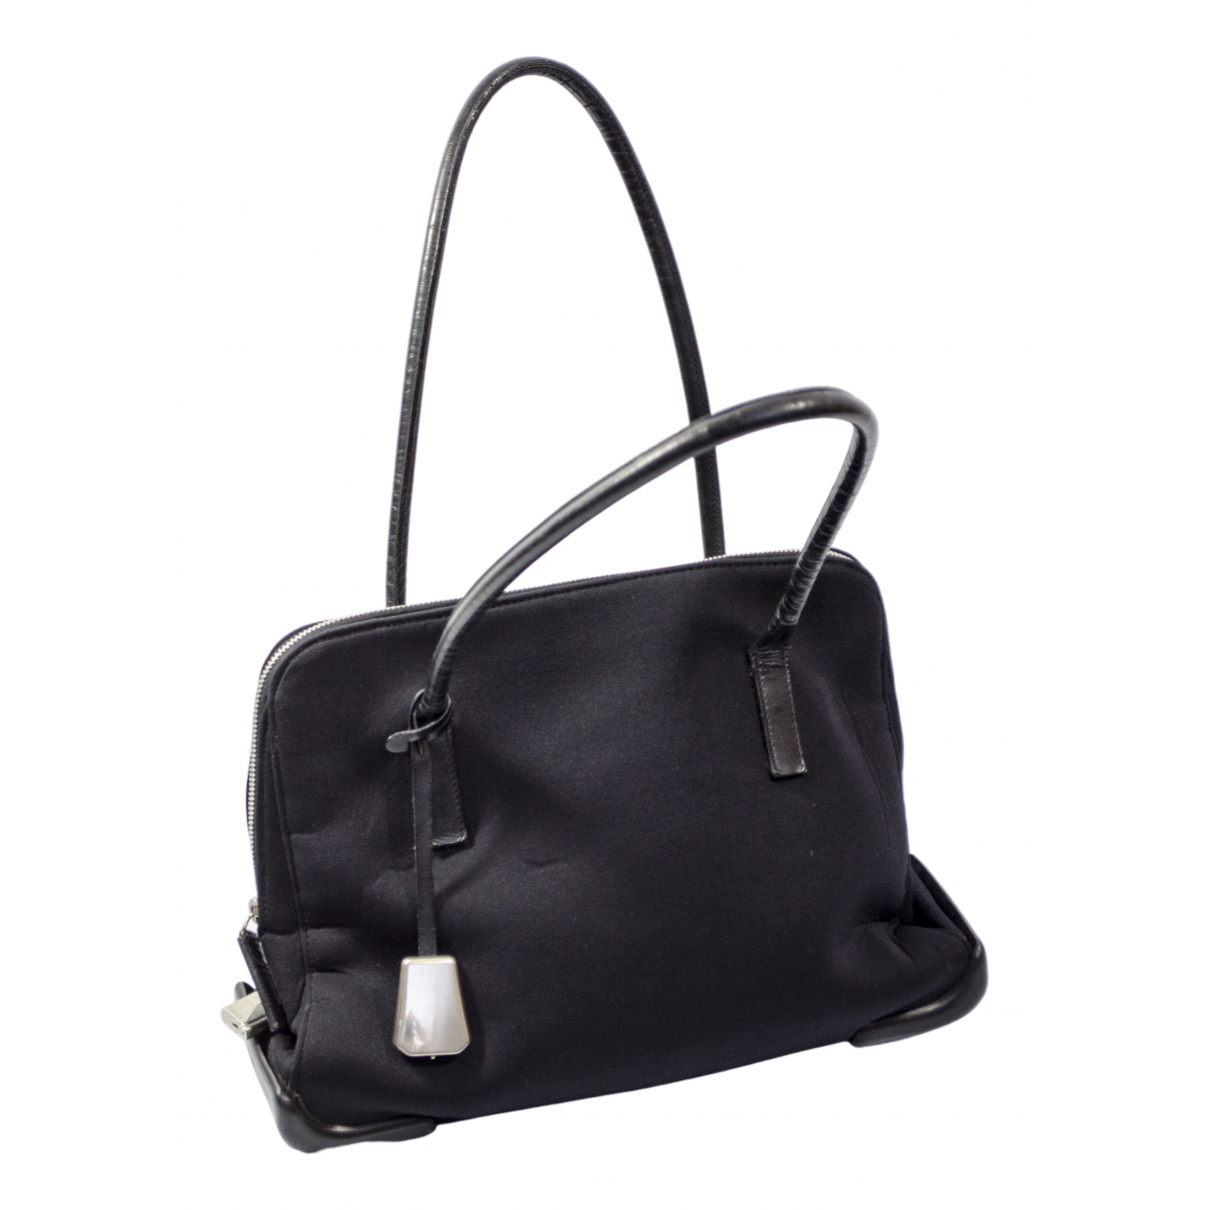 Prada N Blue handbag for Women N